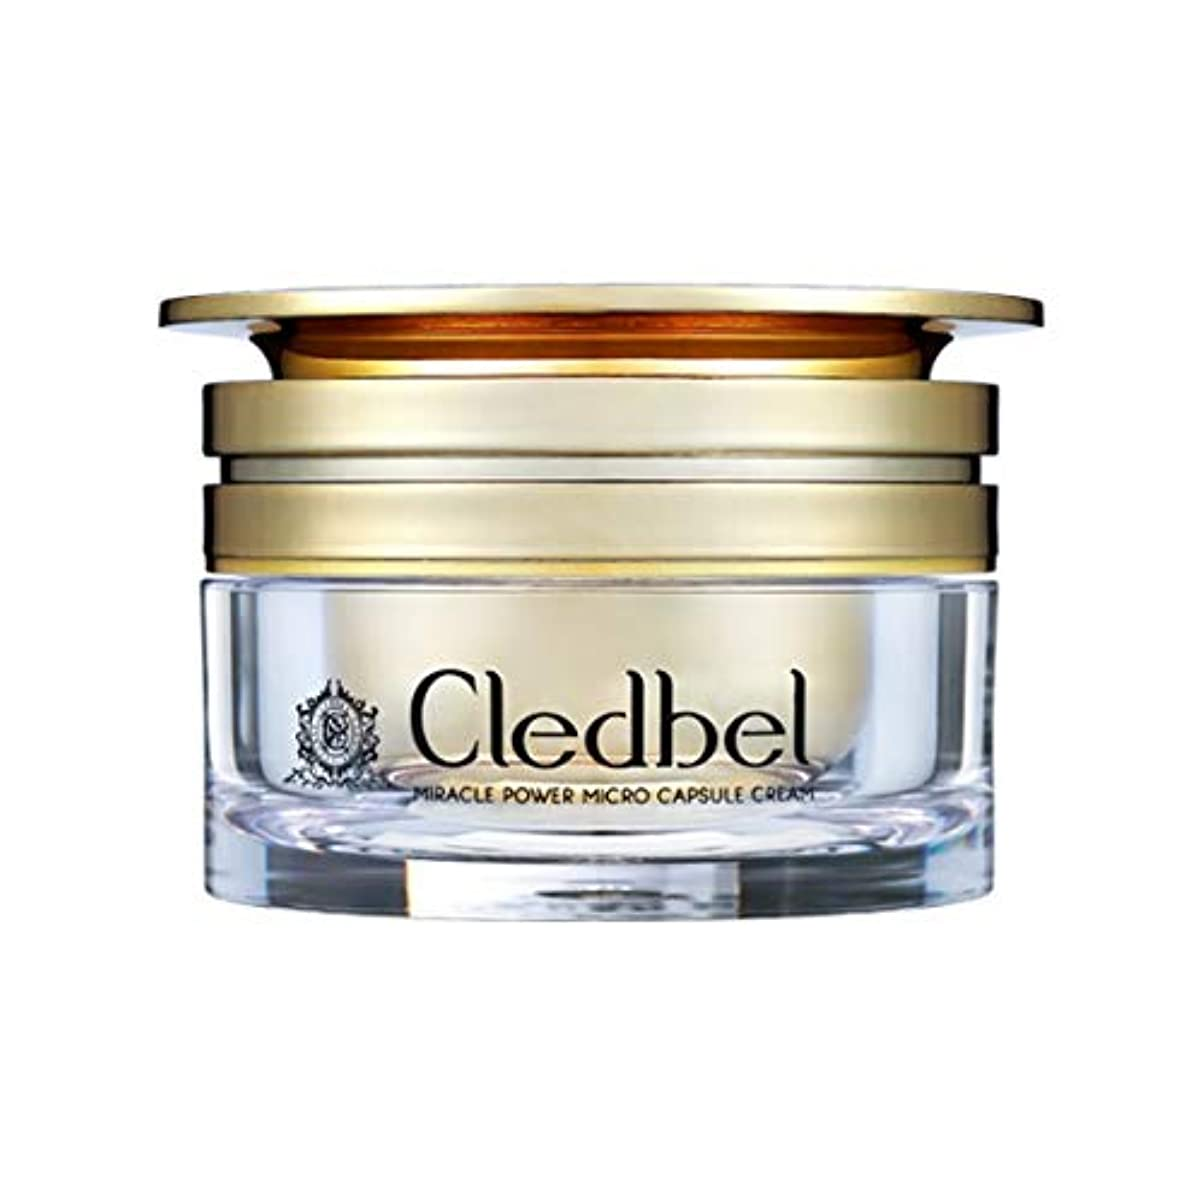 [cledbel] Miracle Power Micro Capsule Cream 50ml / ミラクルパワーマイクロカプセルクリーム 50ml [並行輸入品]